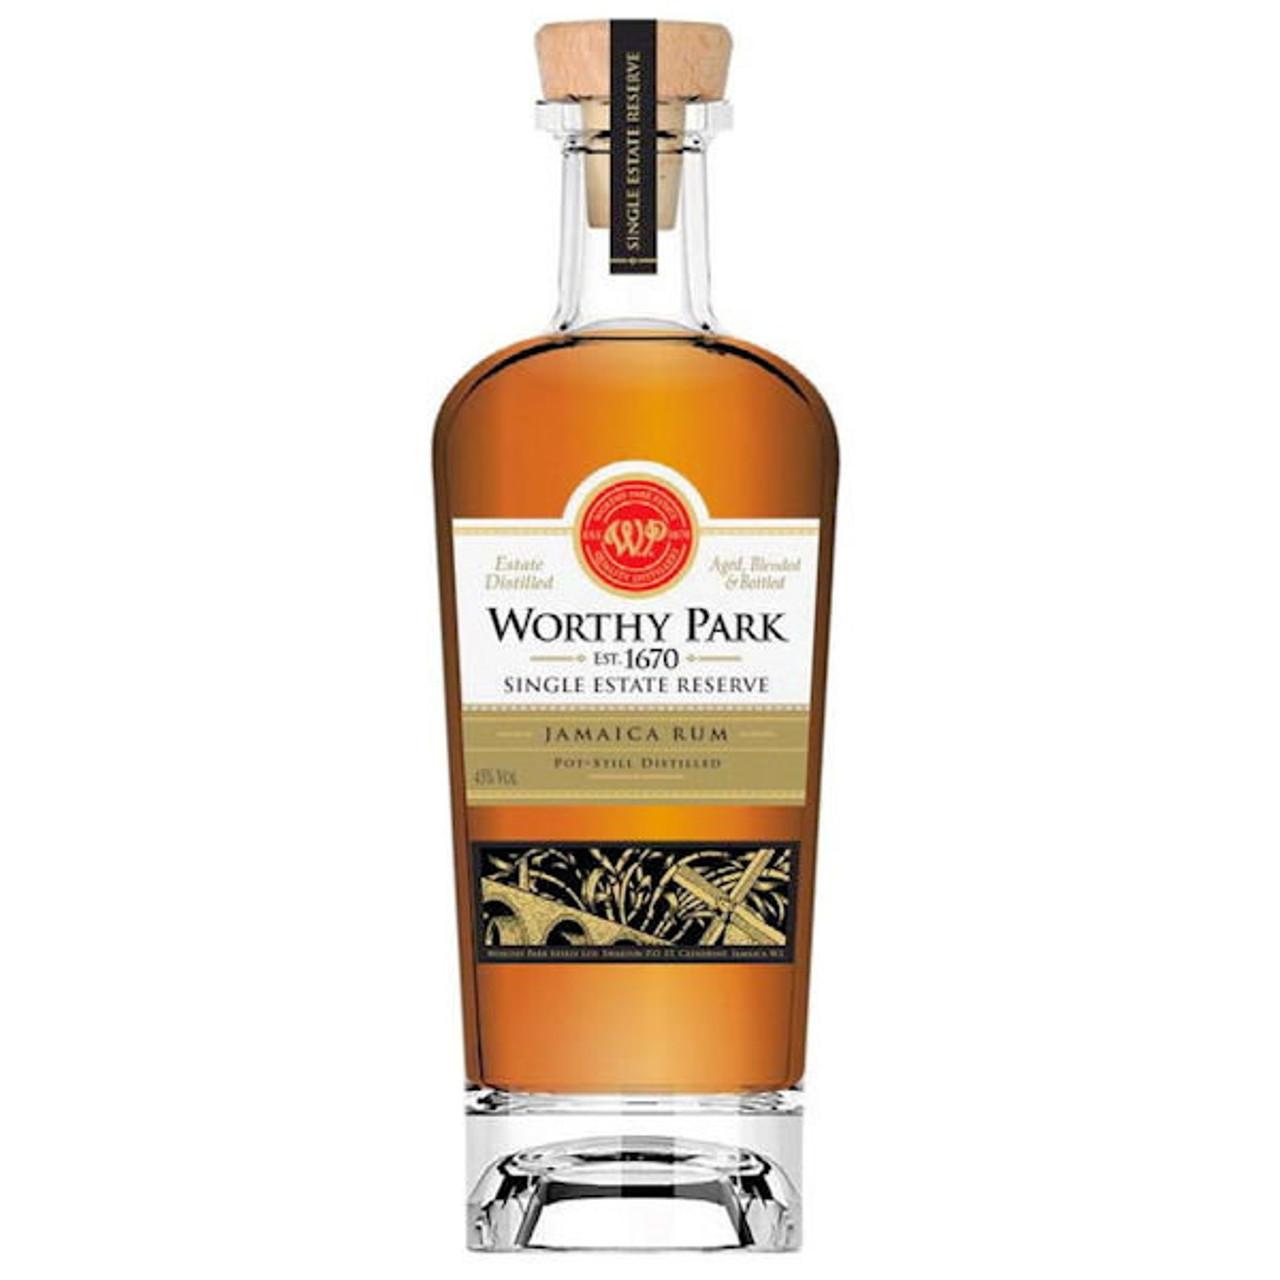 Worthy Park Single Estate Reserve Jamaica Rum 750ml